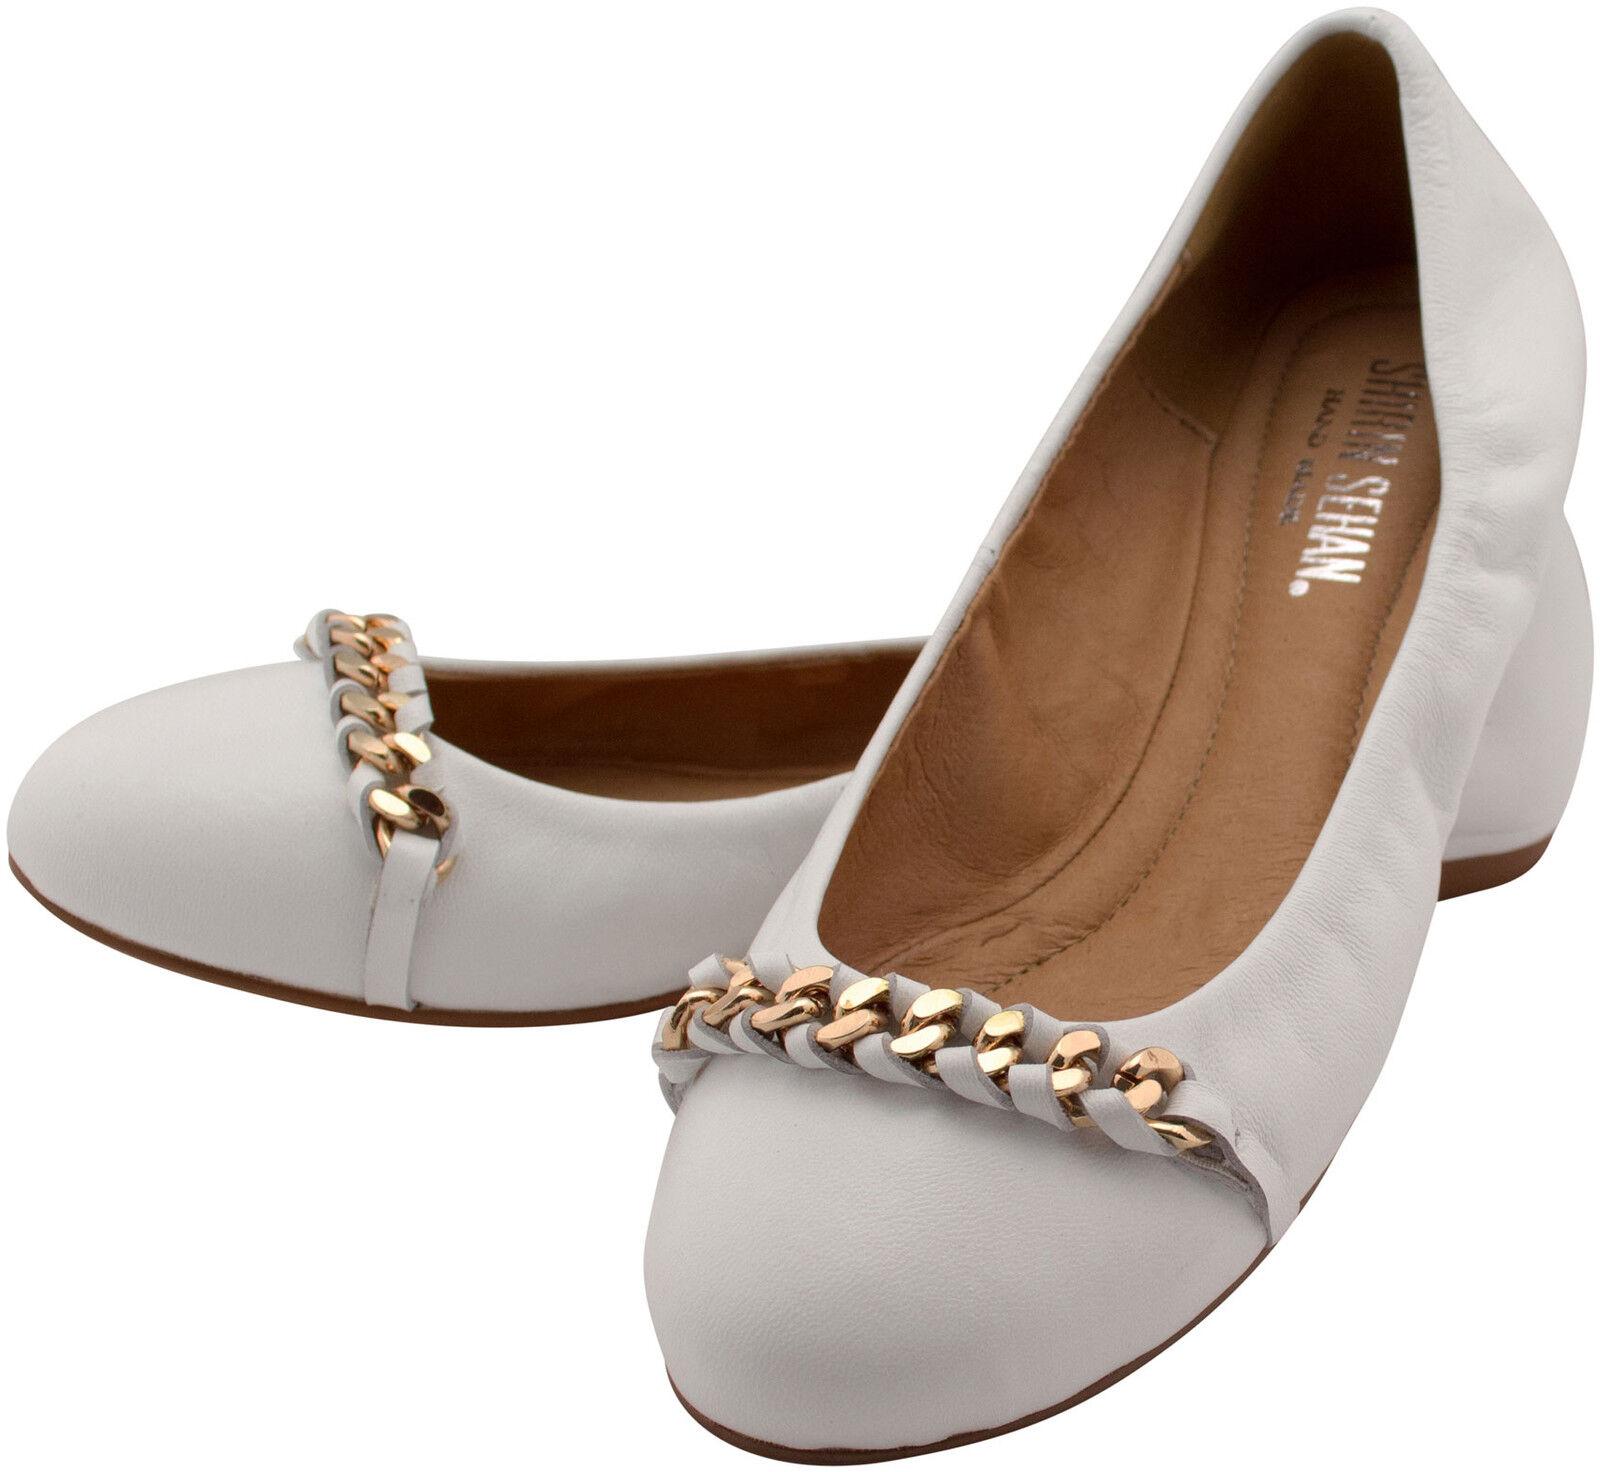 Ballerine stretch Cuir blanc Confortable Décor Chaîne collection Raide Taille 37 blanc